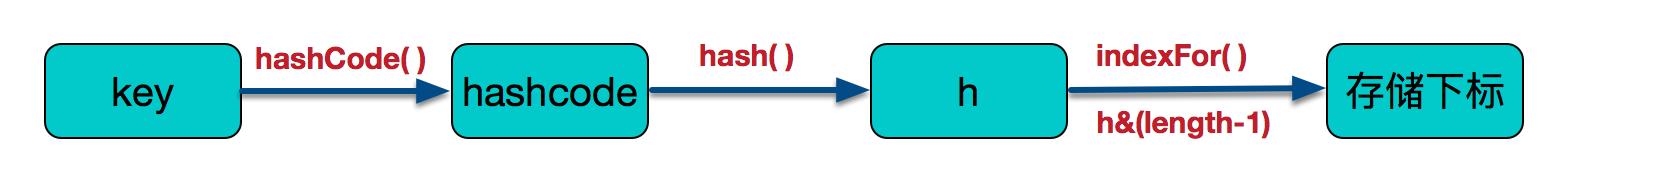 HashMap如何确定元素位置